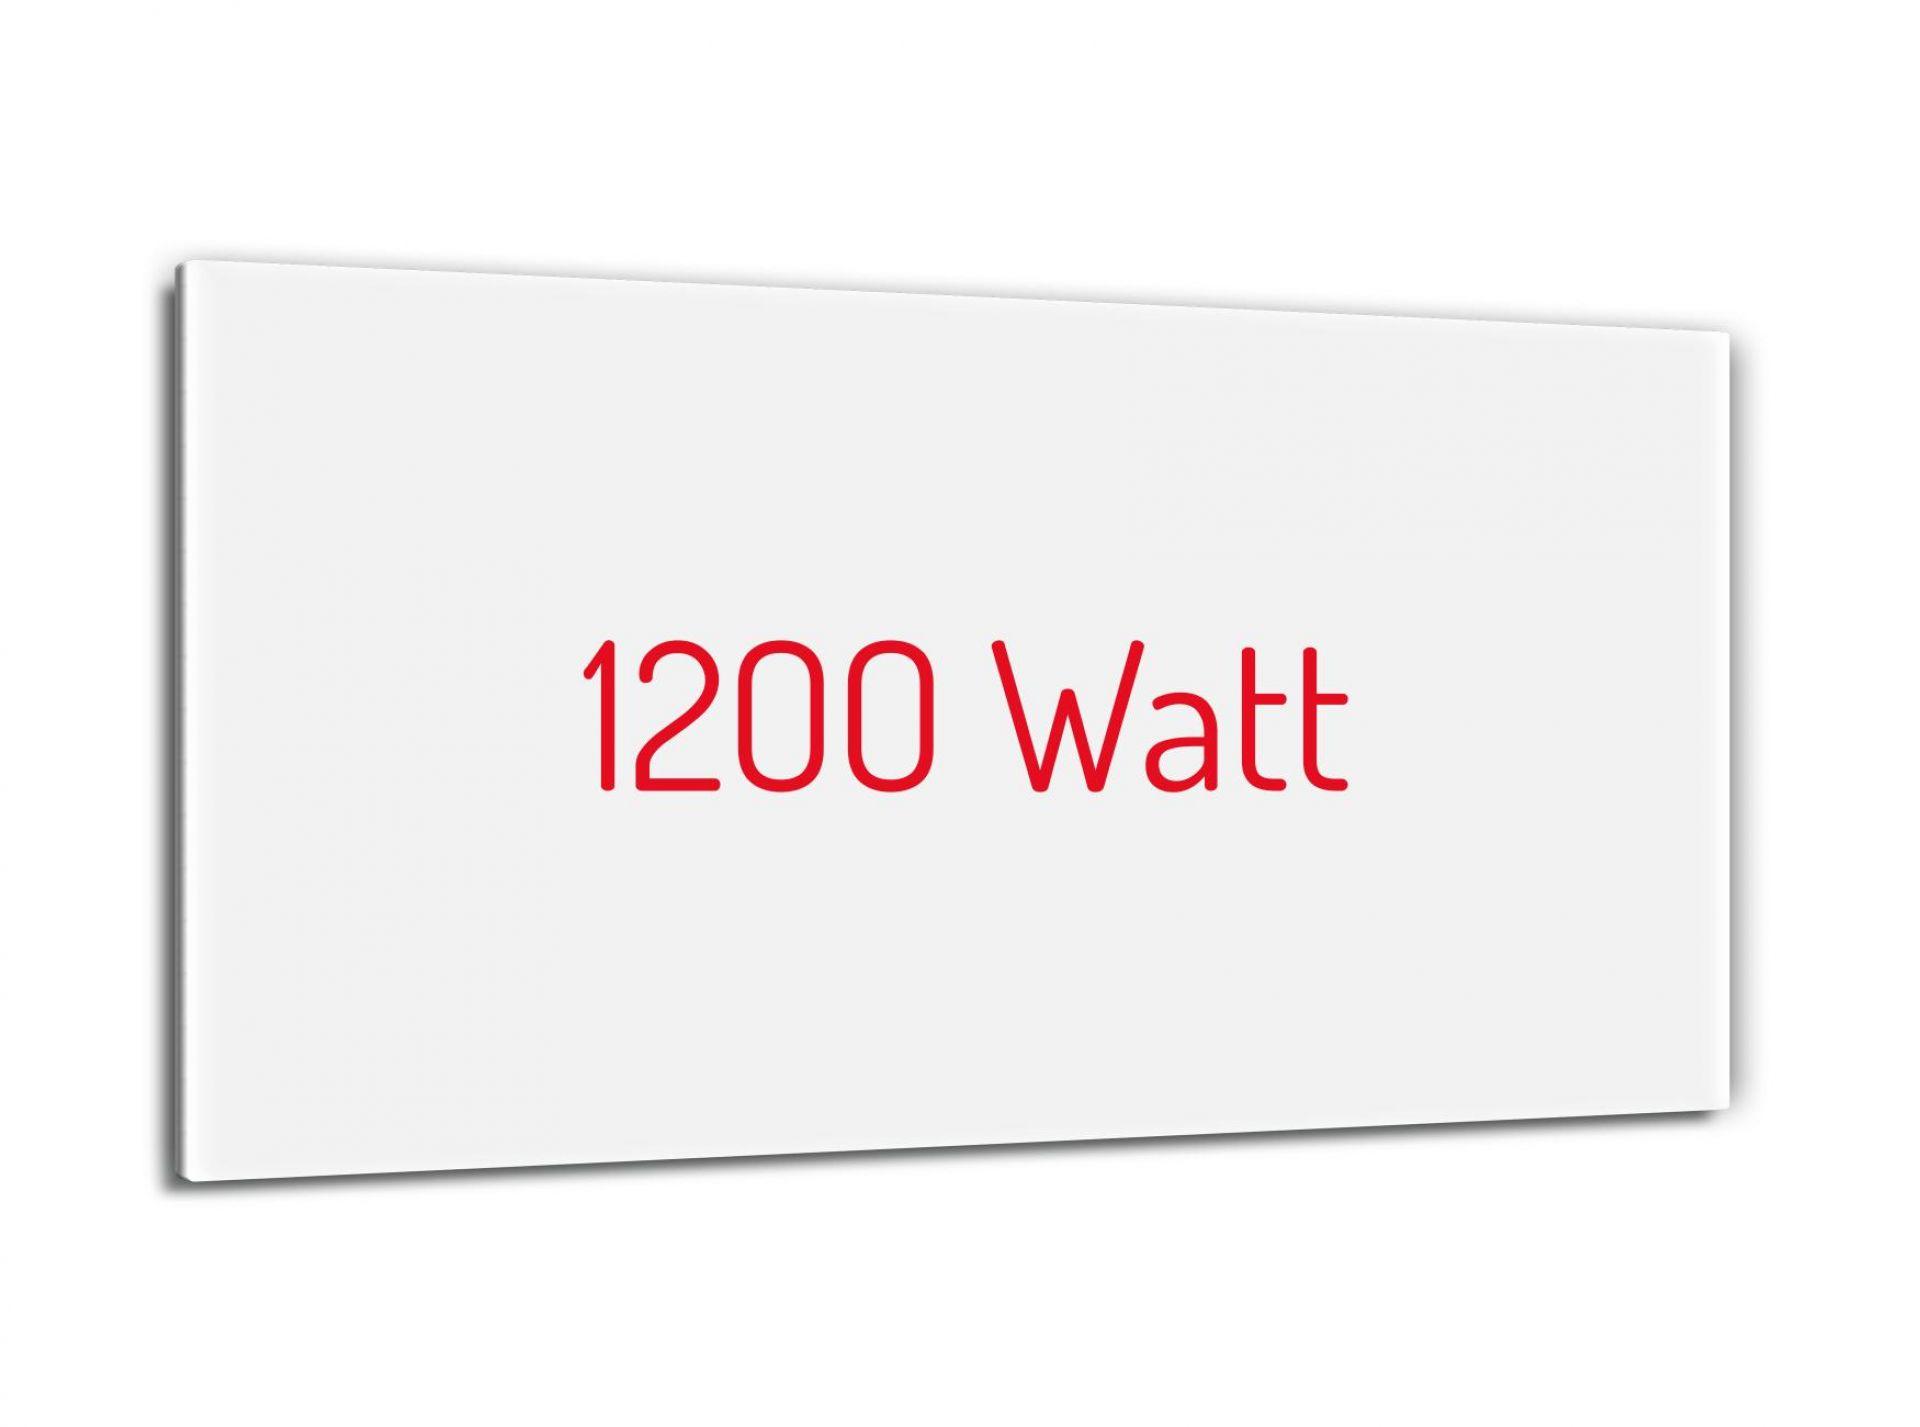 PowerSun Reflex, weiß, glatt, 1200 watt, Knebel infrarotheizungen